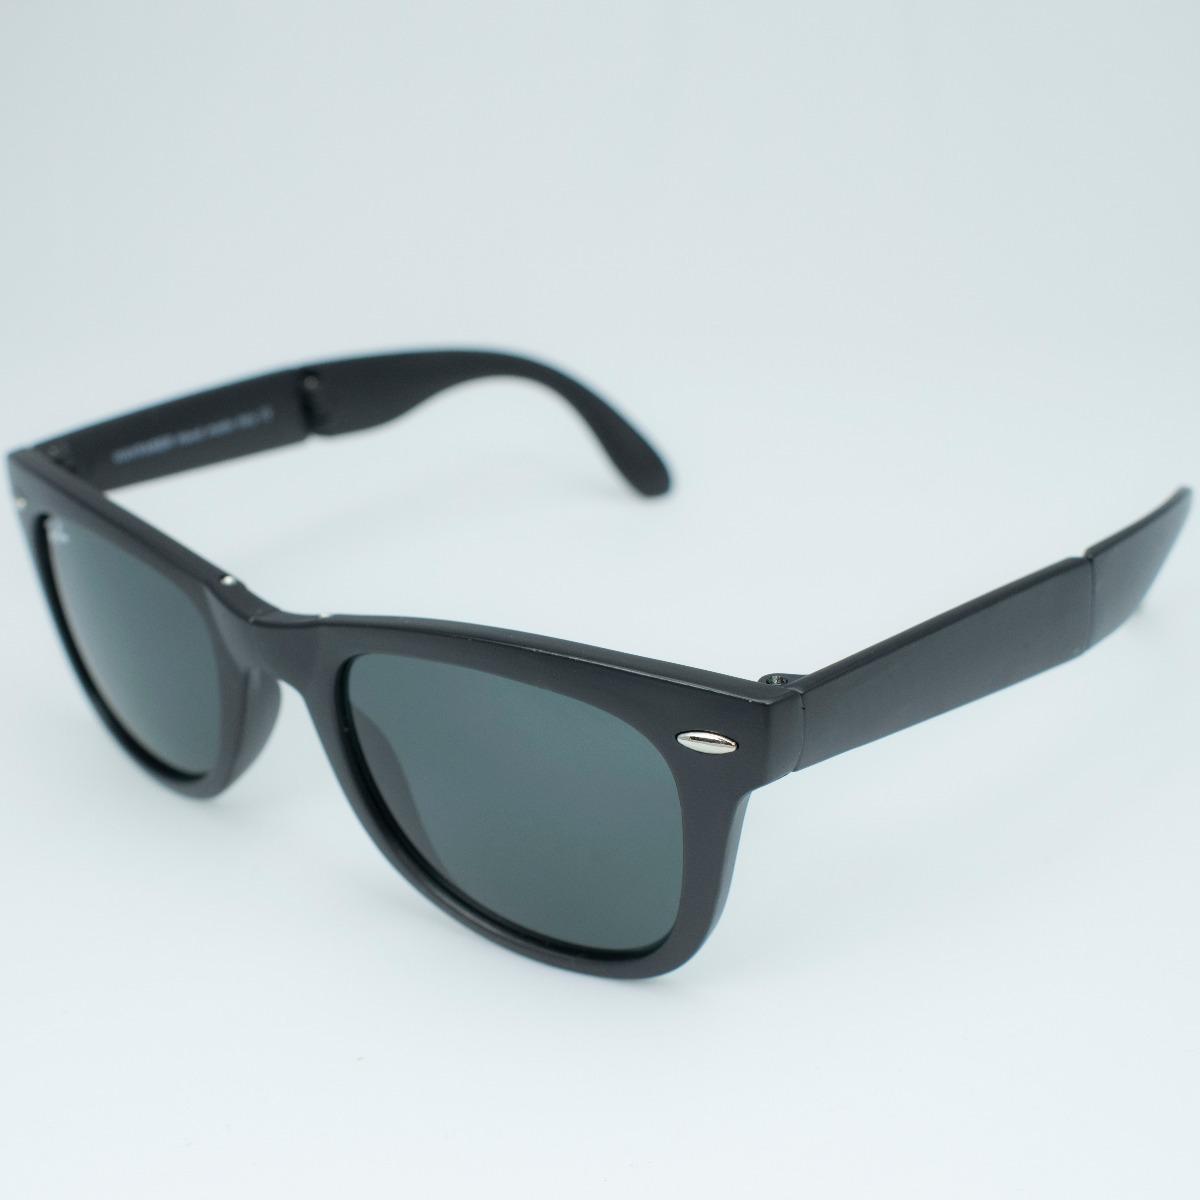 534336cc8 Óculos Sol Feminino Masculino Preto Fosco Redondo Sem Veludo - R$ 45 ...